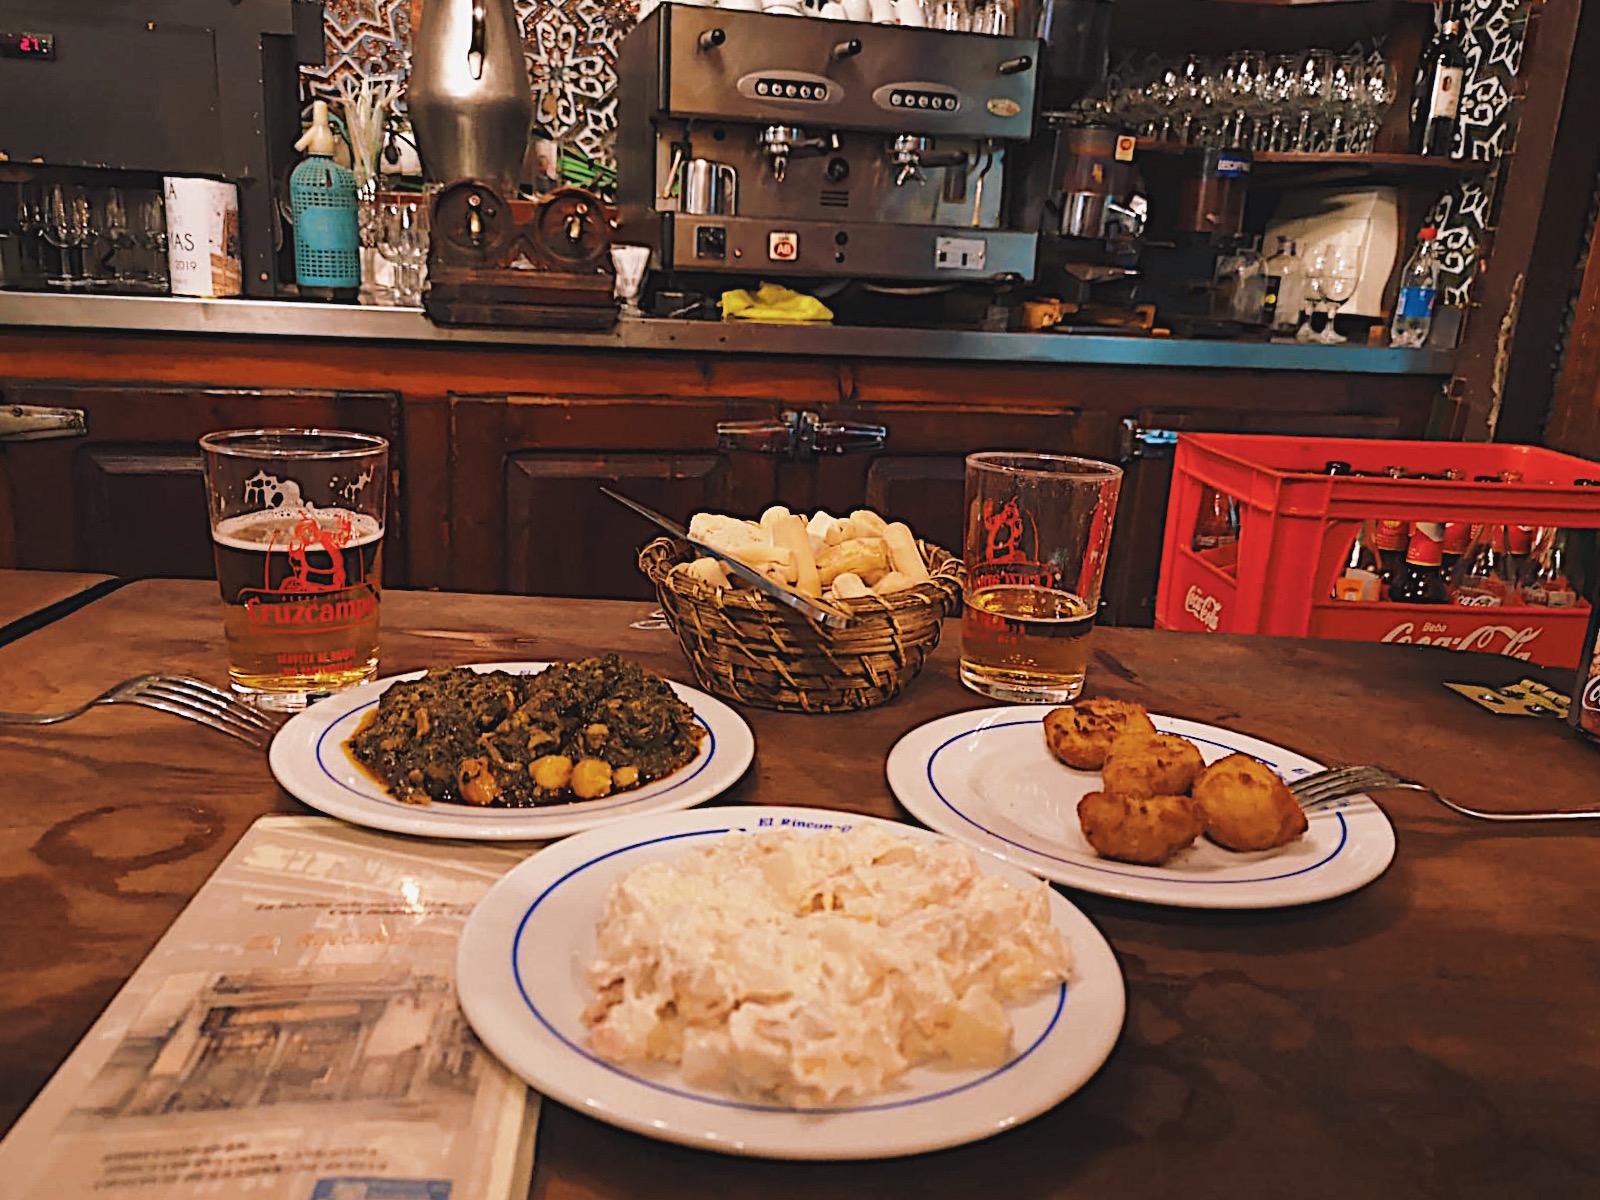 redhead-round-the-world-blogger-food-foodie-foodblog-spain-el-rinconcillo-inside-food-menu.JPG